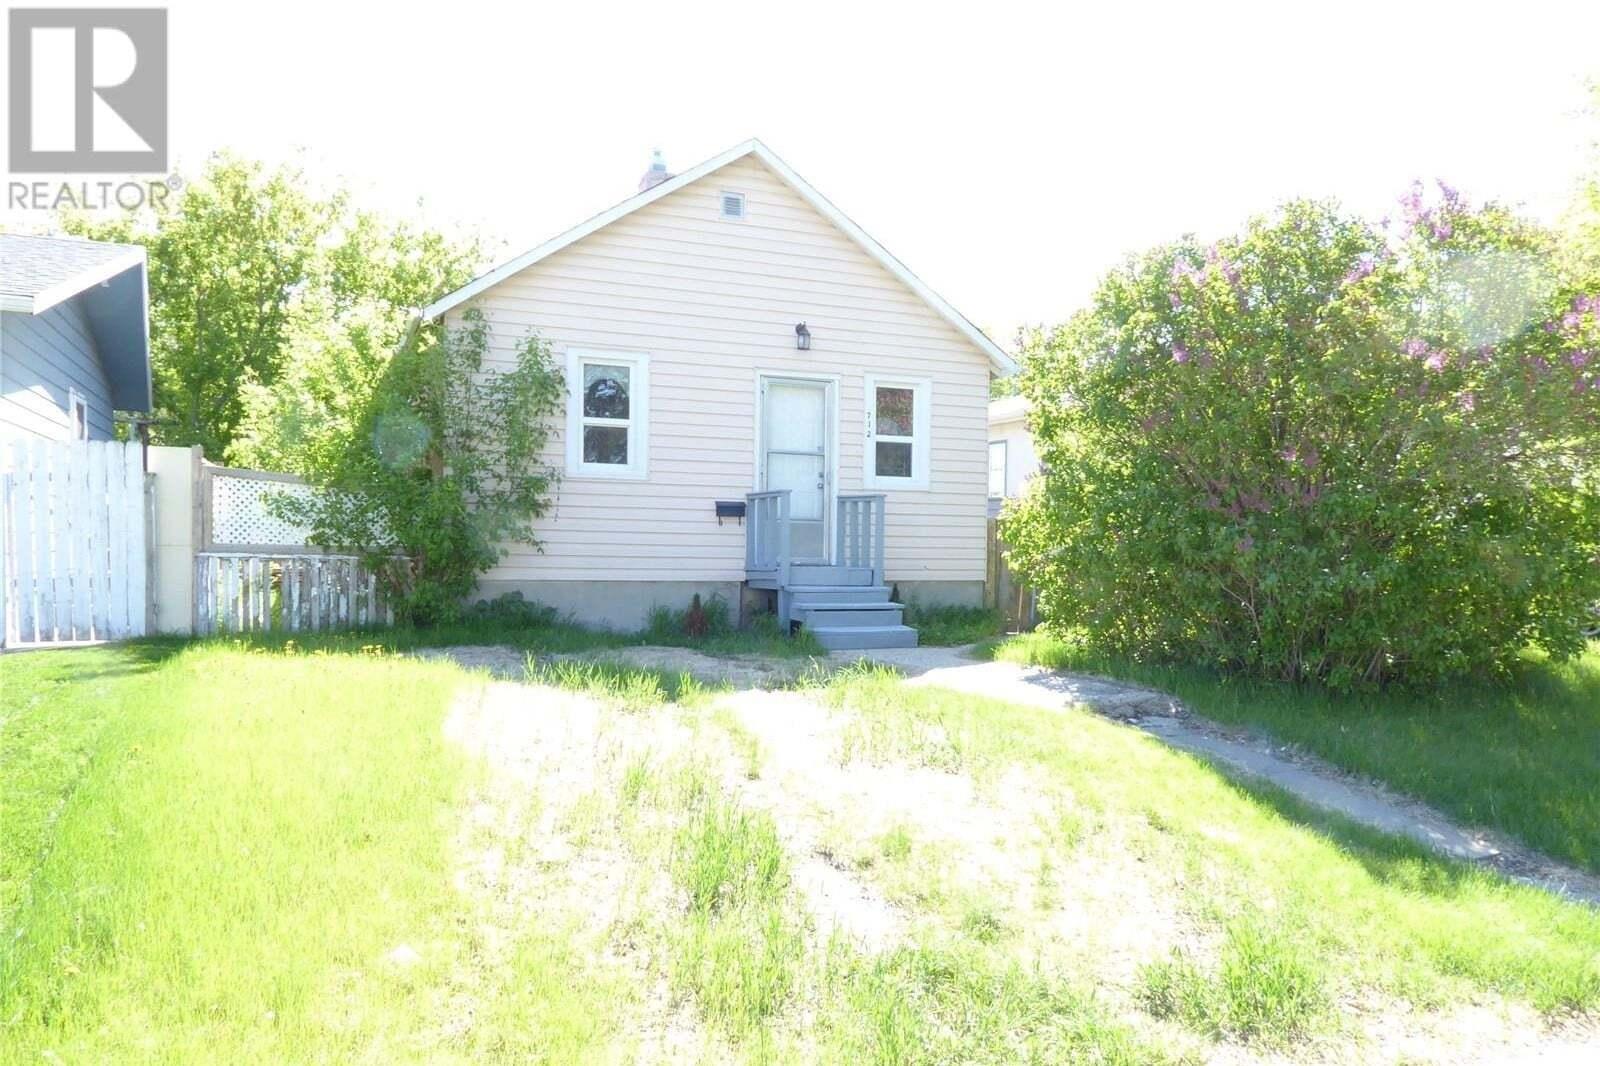 House for sale at 712 O Ave S Saskatoon Saskatchewan - MLS: SK810154